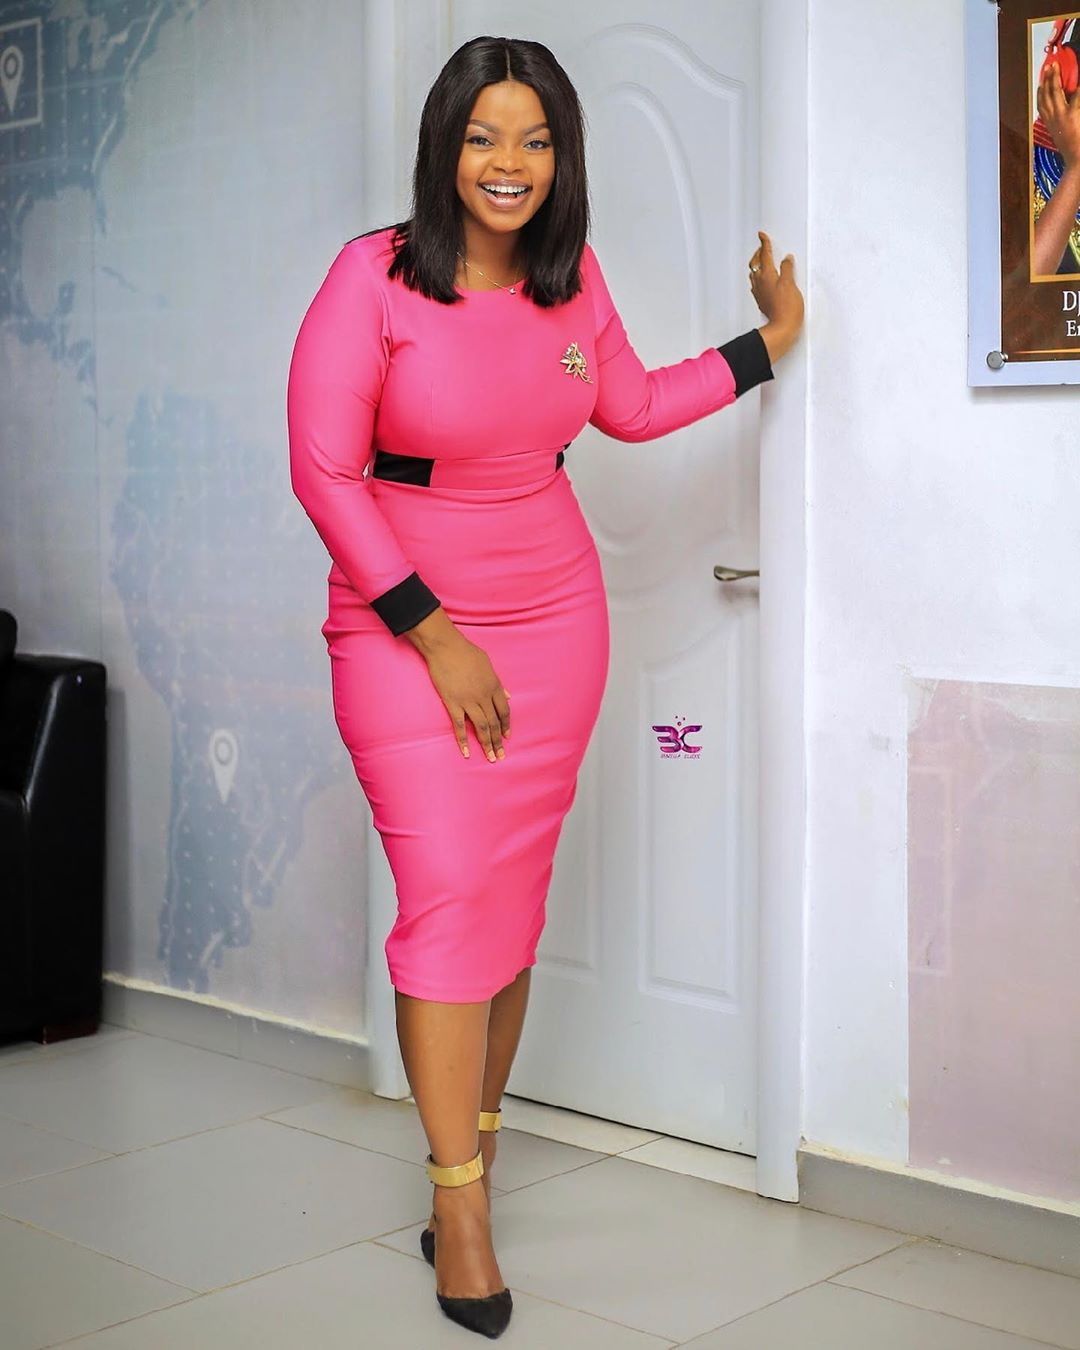 TV3 presenter Ayisha Yakubuu looks Hot and Curvy in new